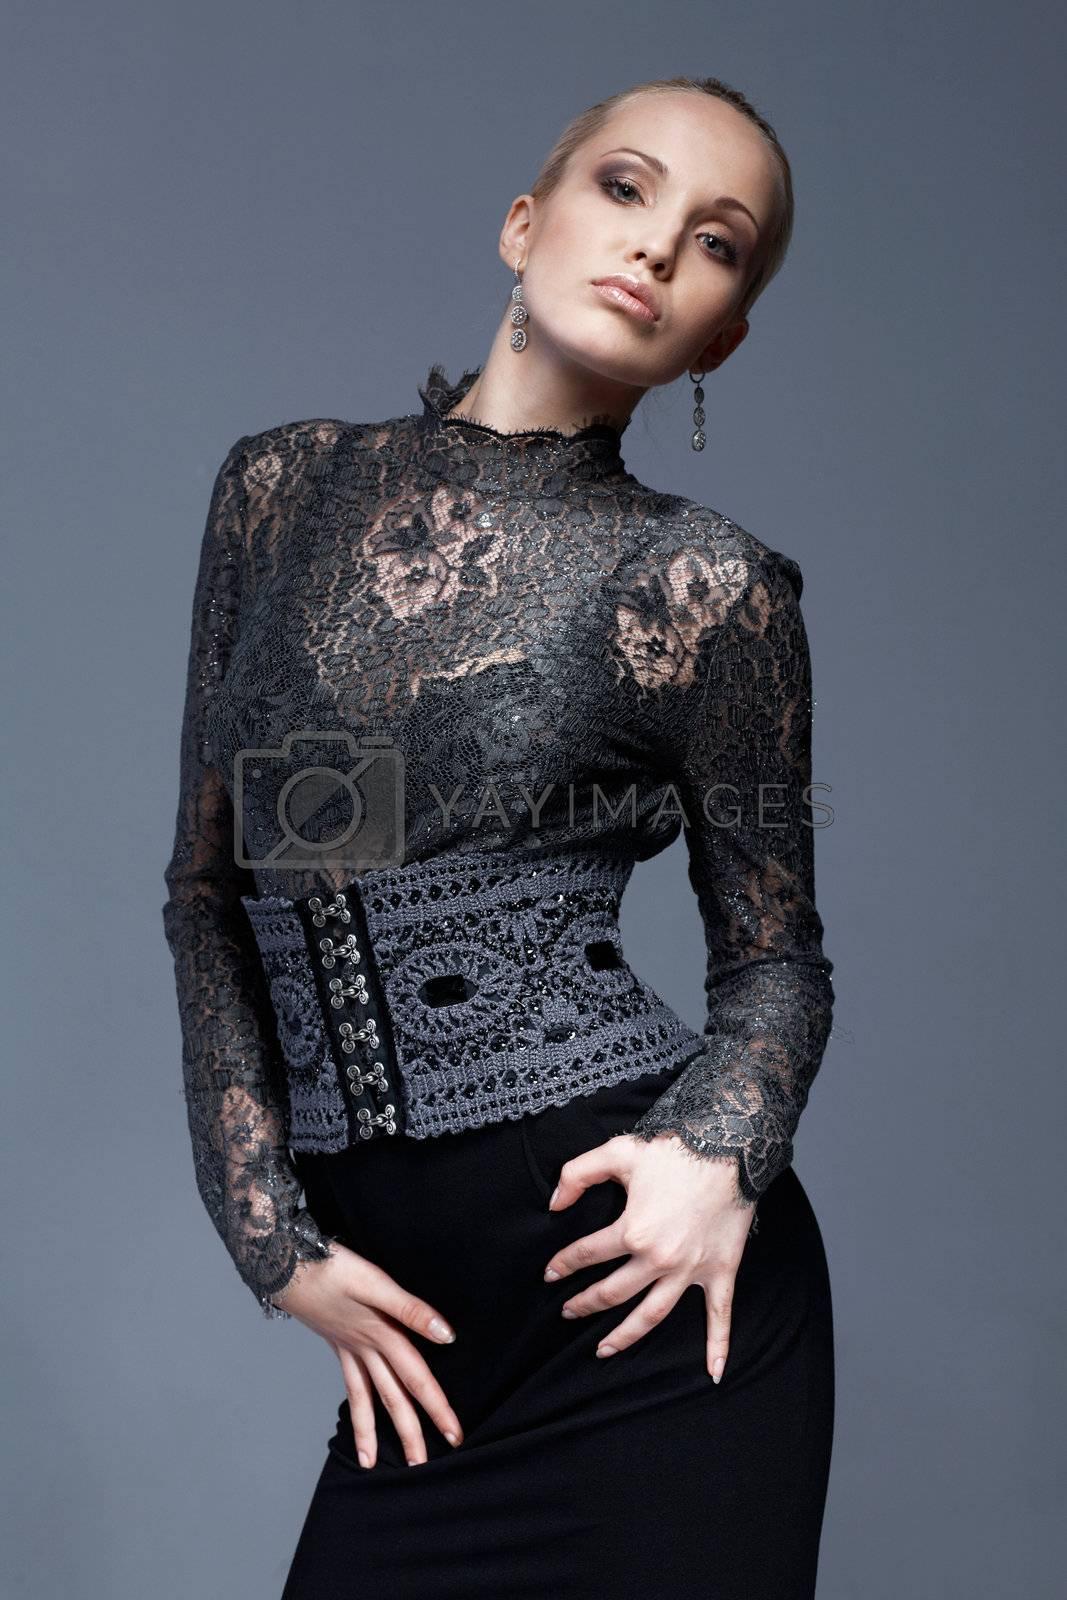 Portrait of a beautiful model in black, lace blouse, posing.